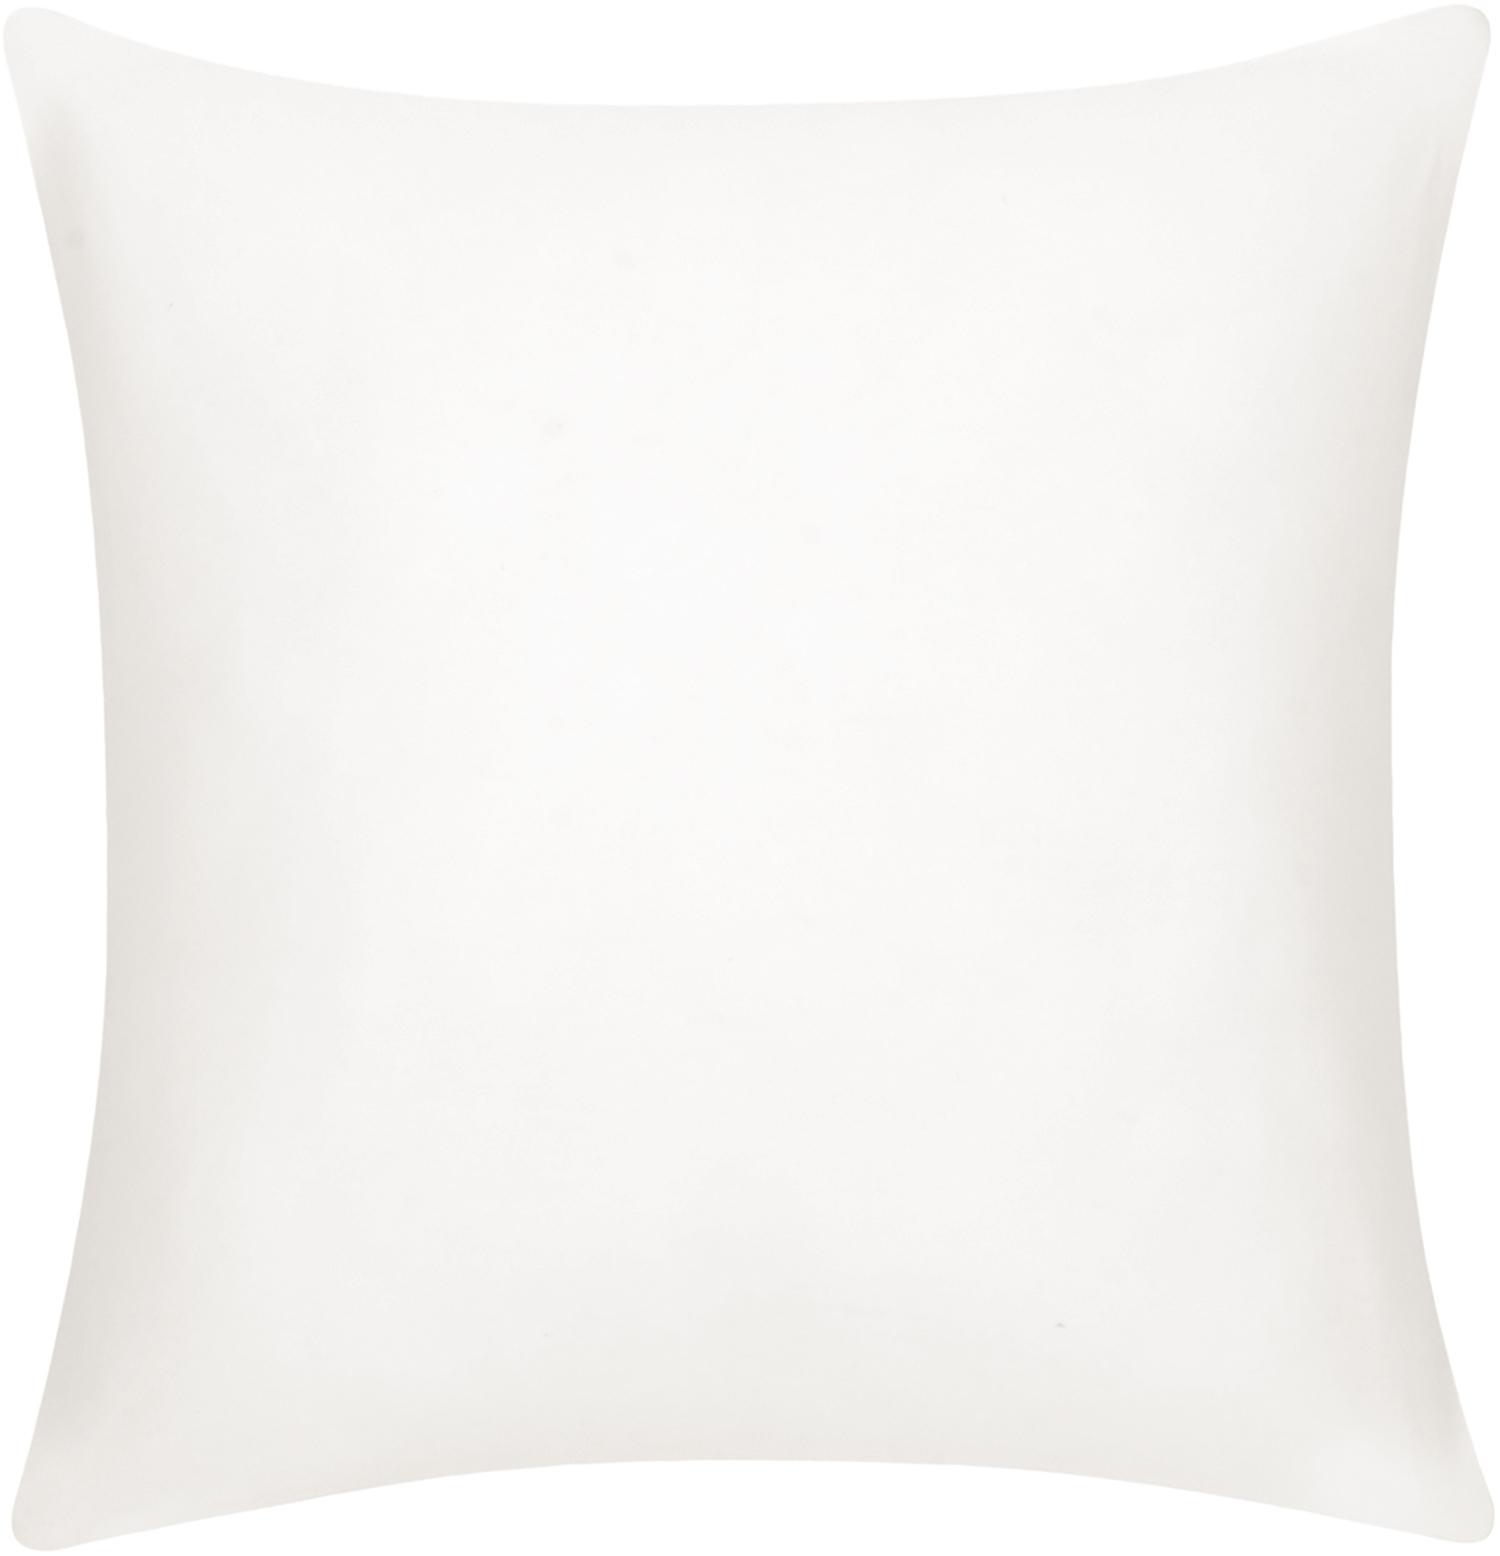 Funda de cojín de algodón Mads, 100%algodón, Blanco crema, An 40 x L 40 cm